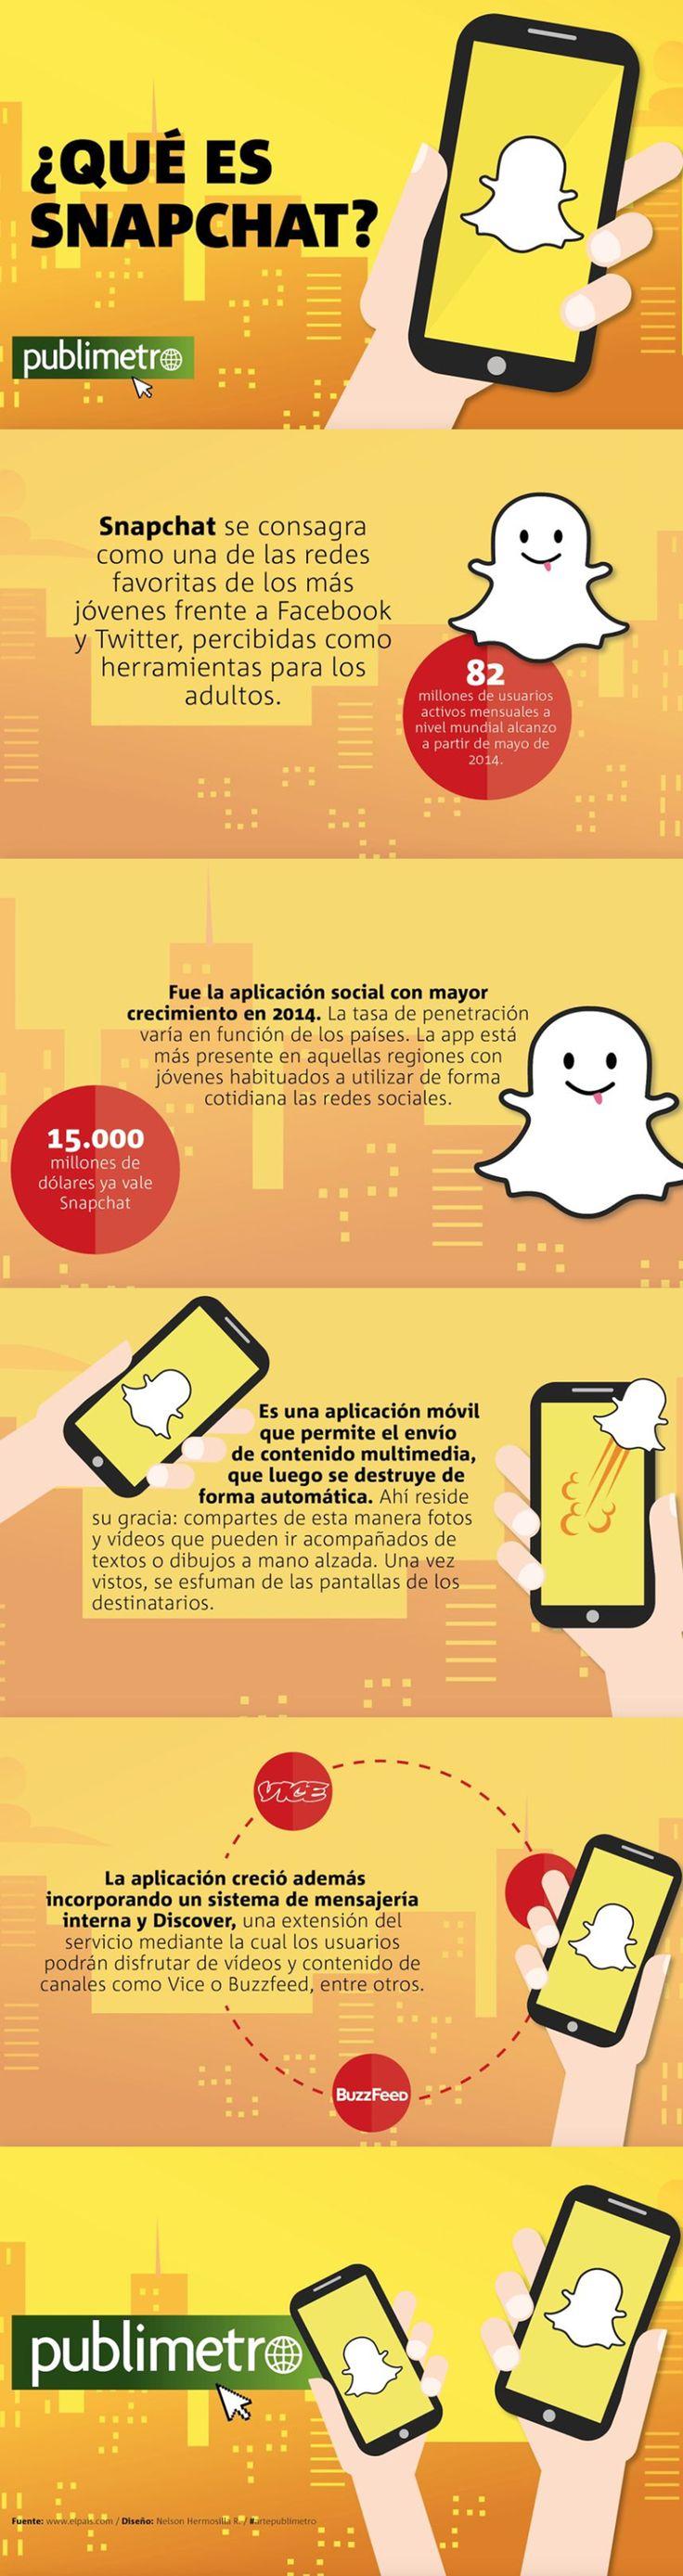 Qué es SnapChat #infografia #infographic #socialmedia